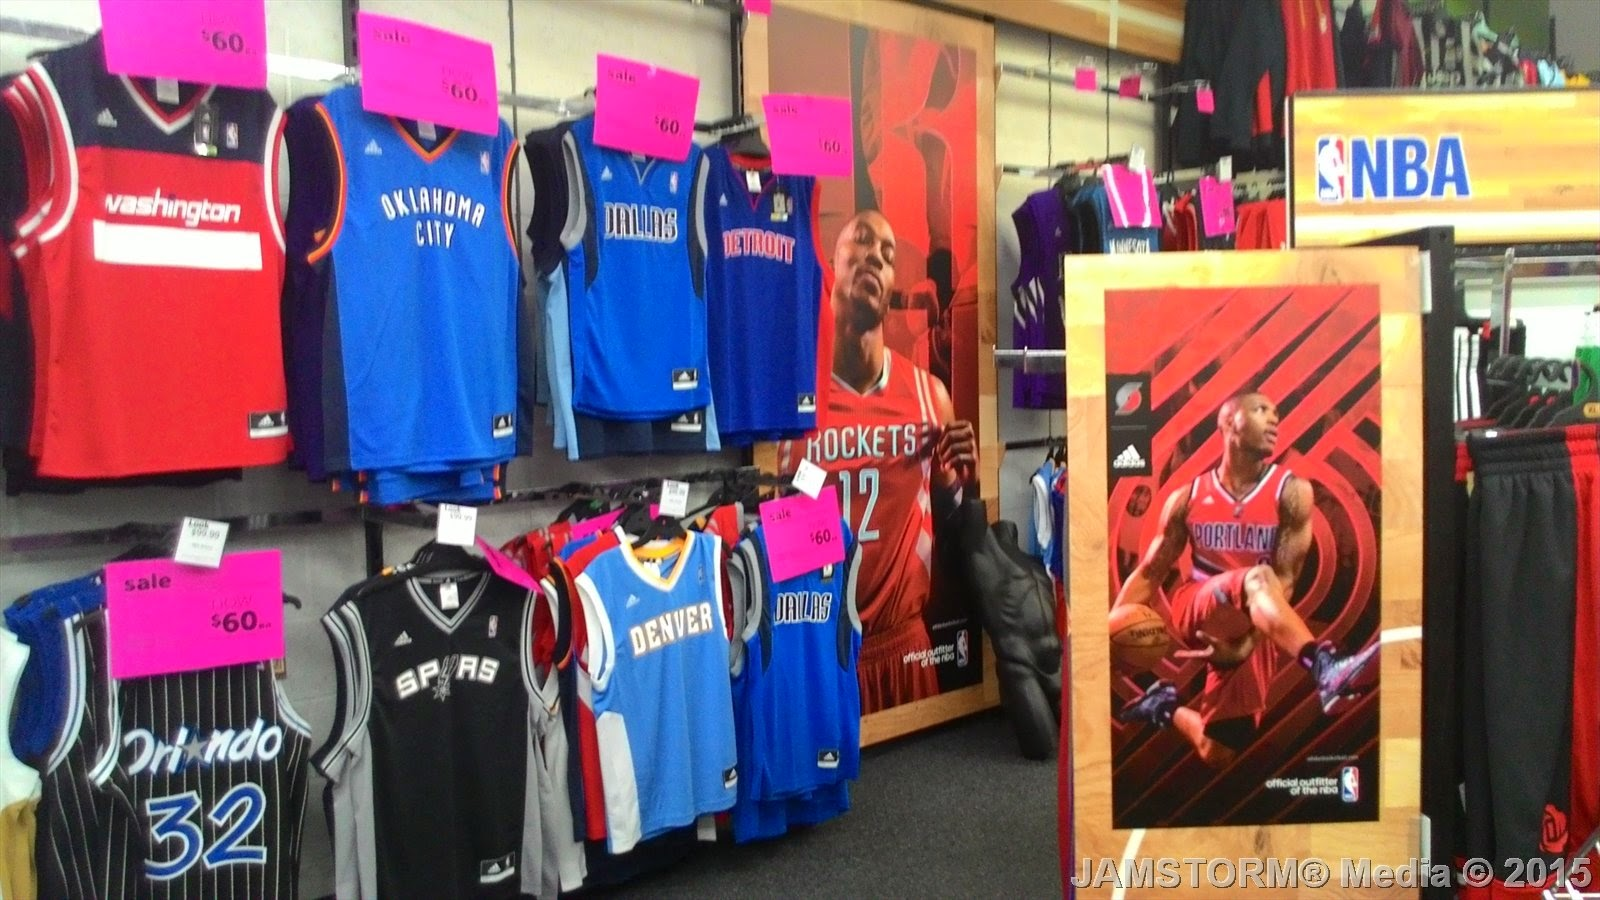 Nba Basketball Store Australia b2b992f8c447